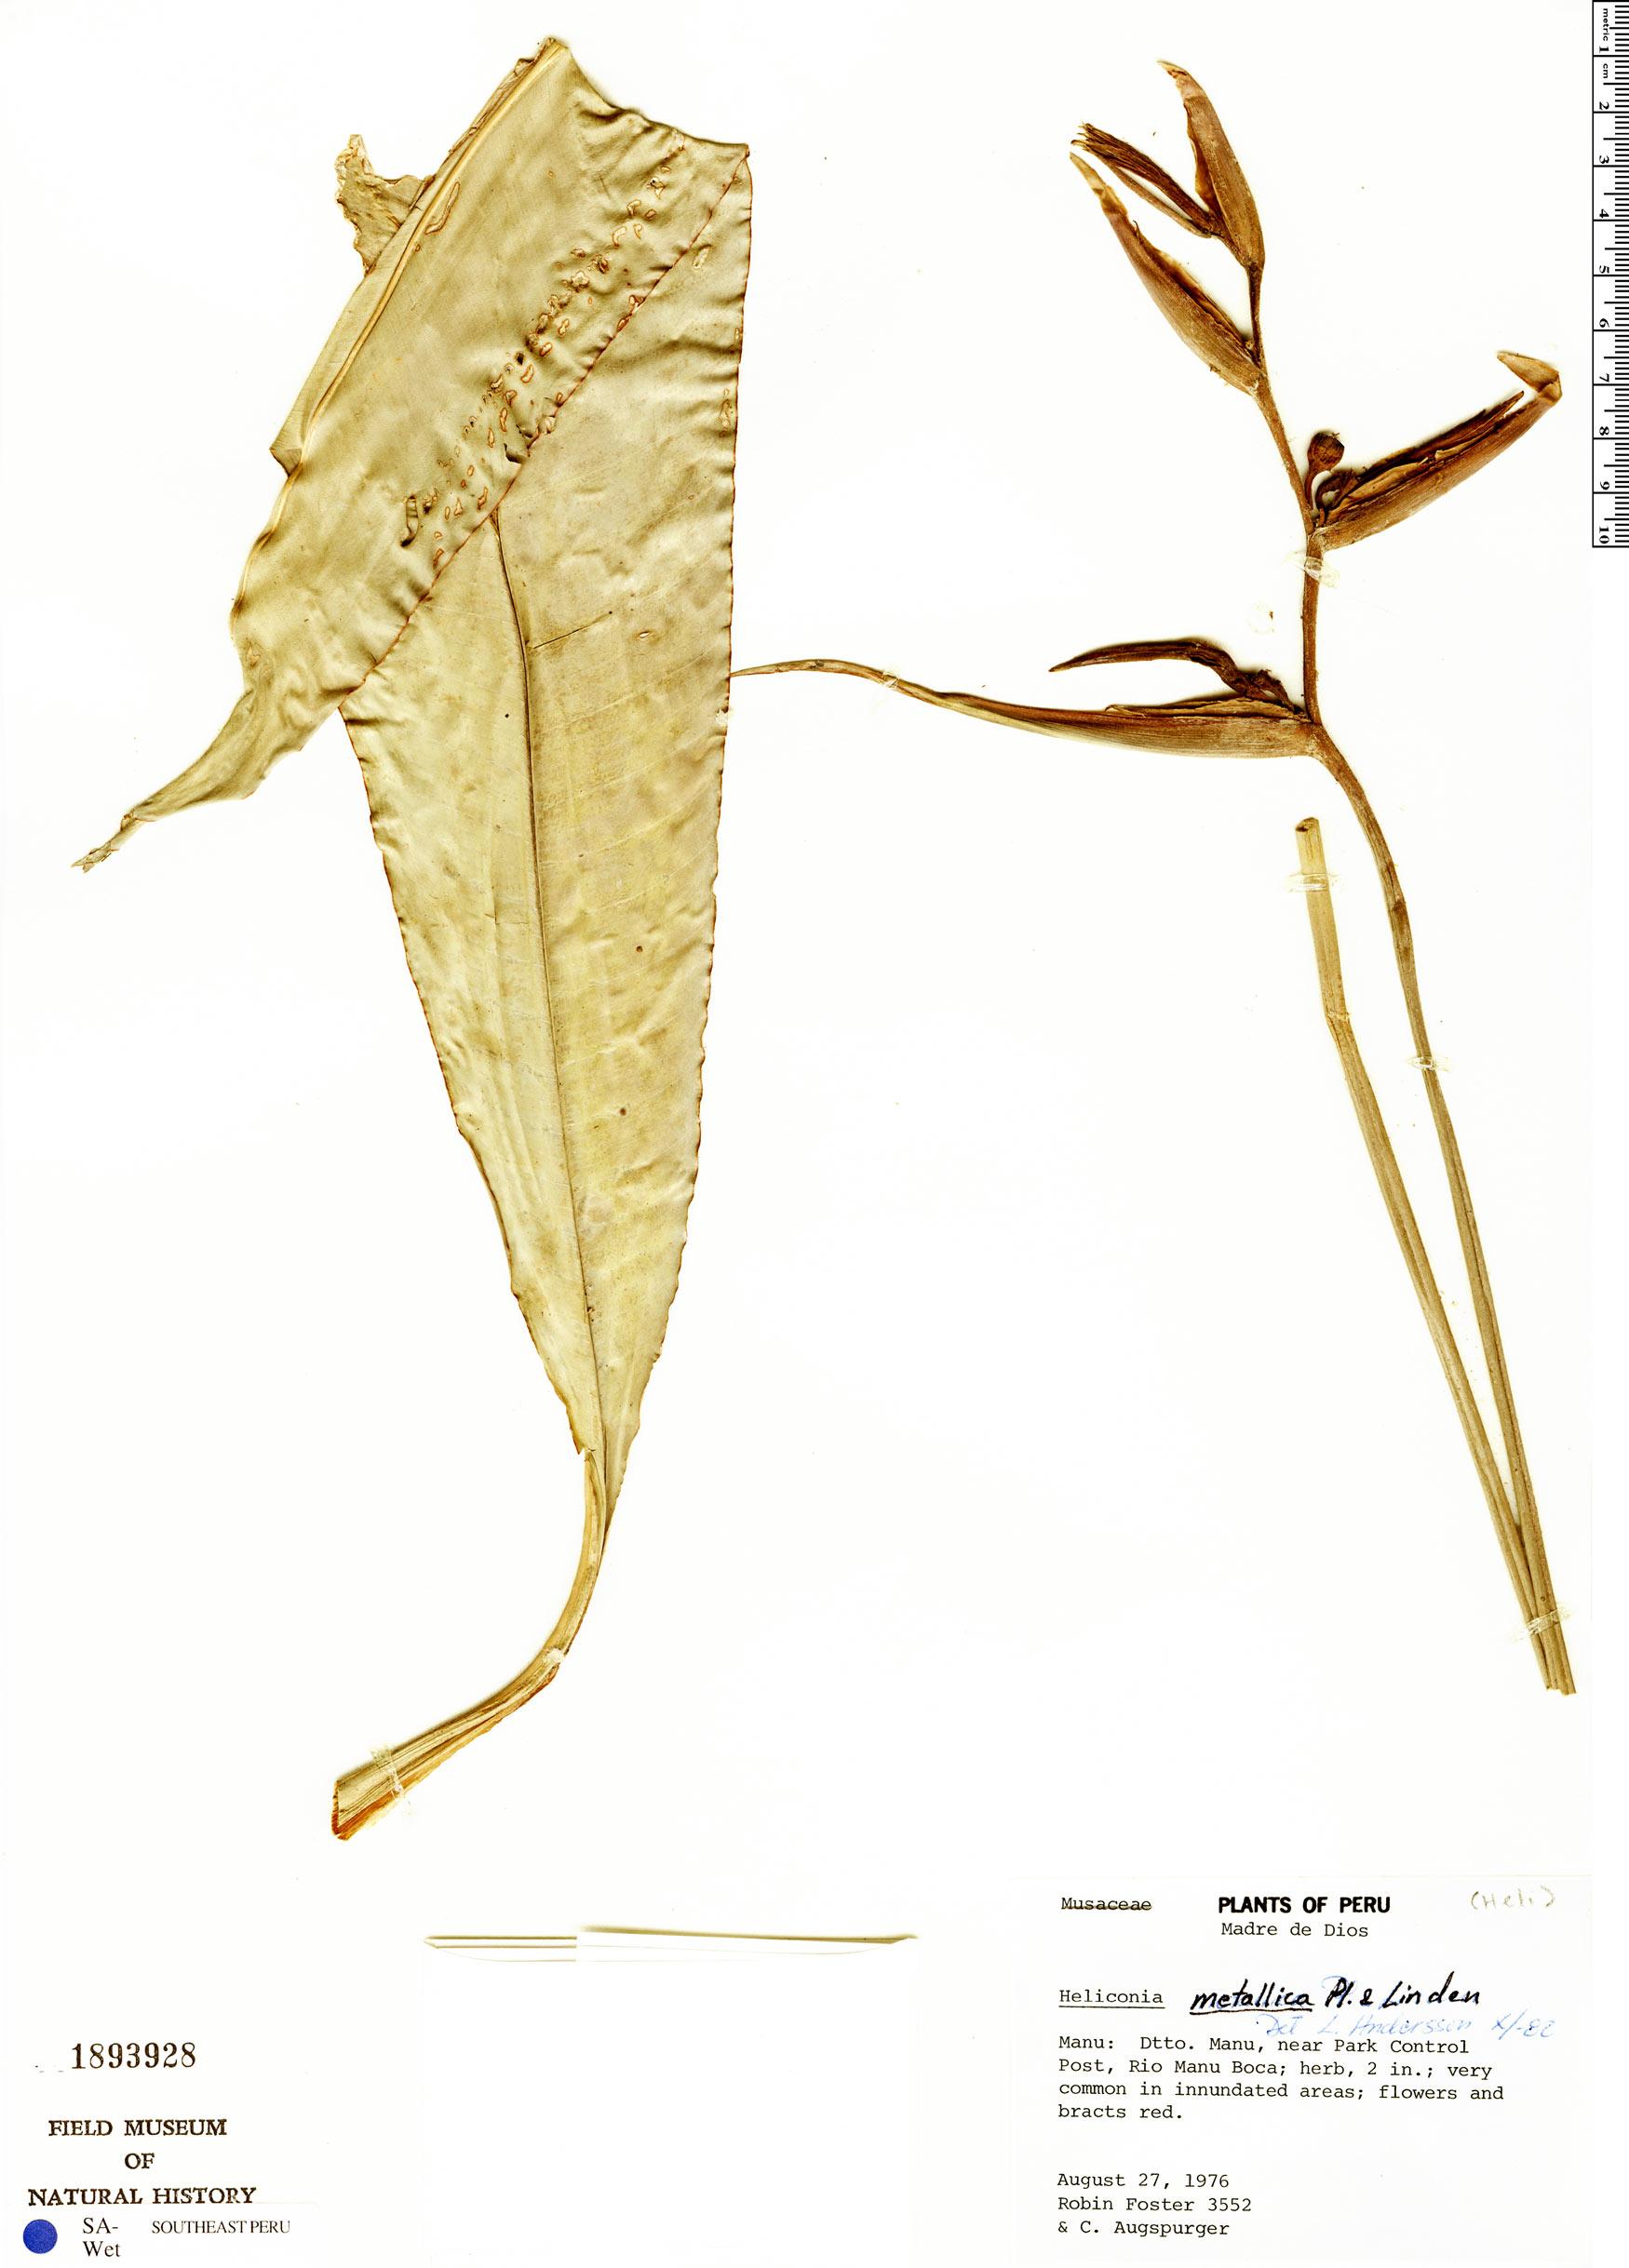 Specimen: Heliconia metallica